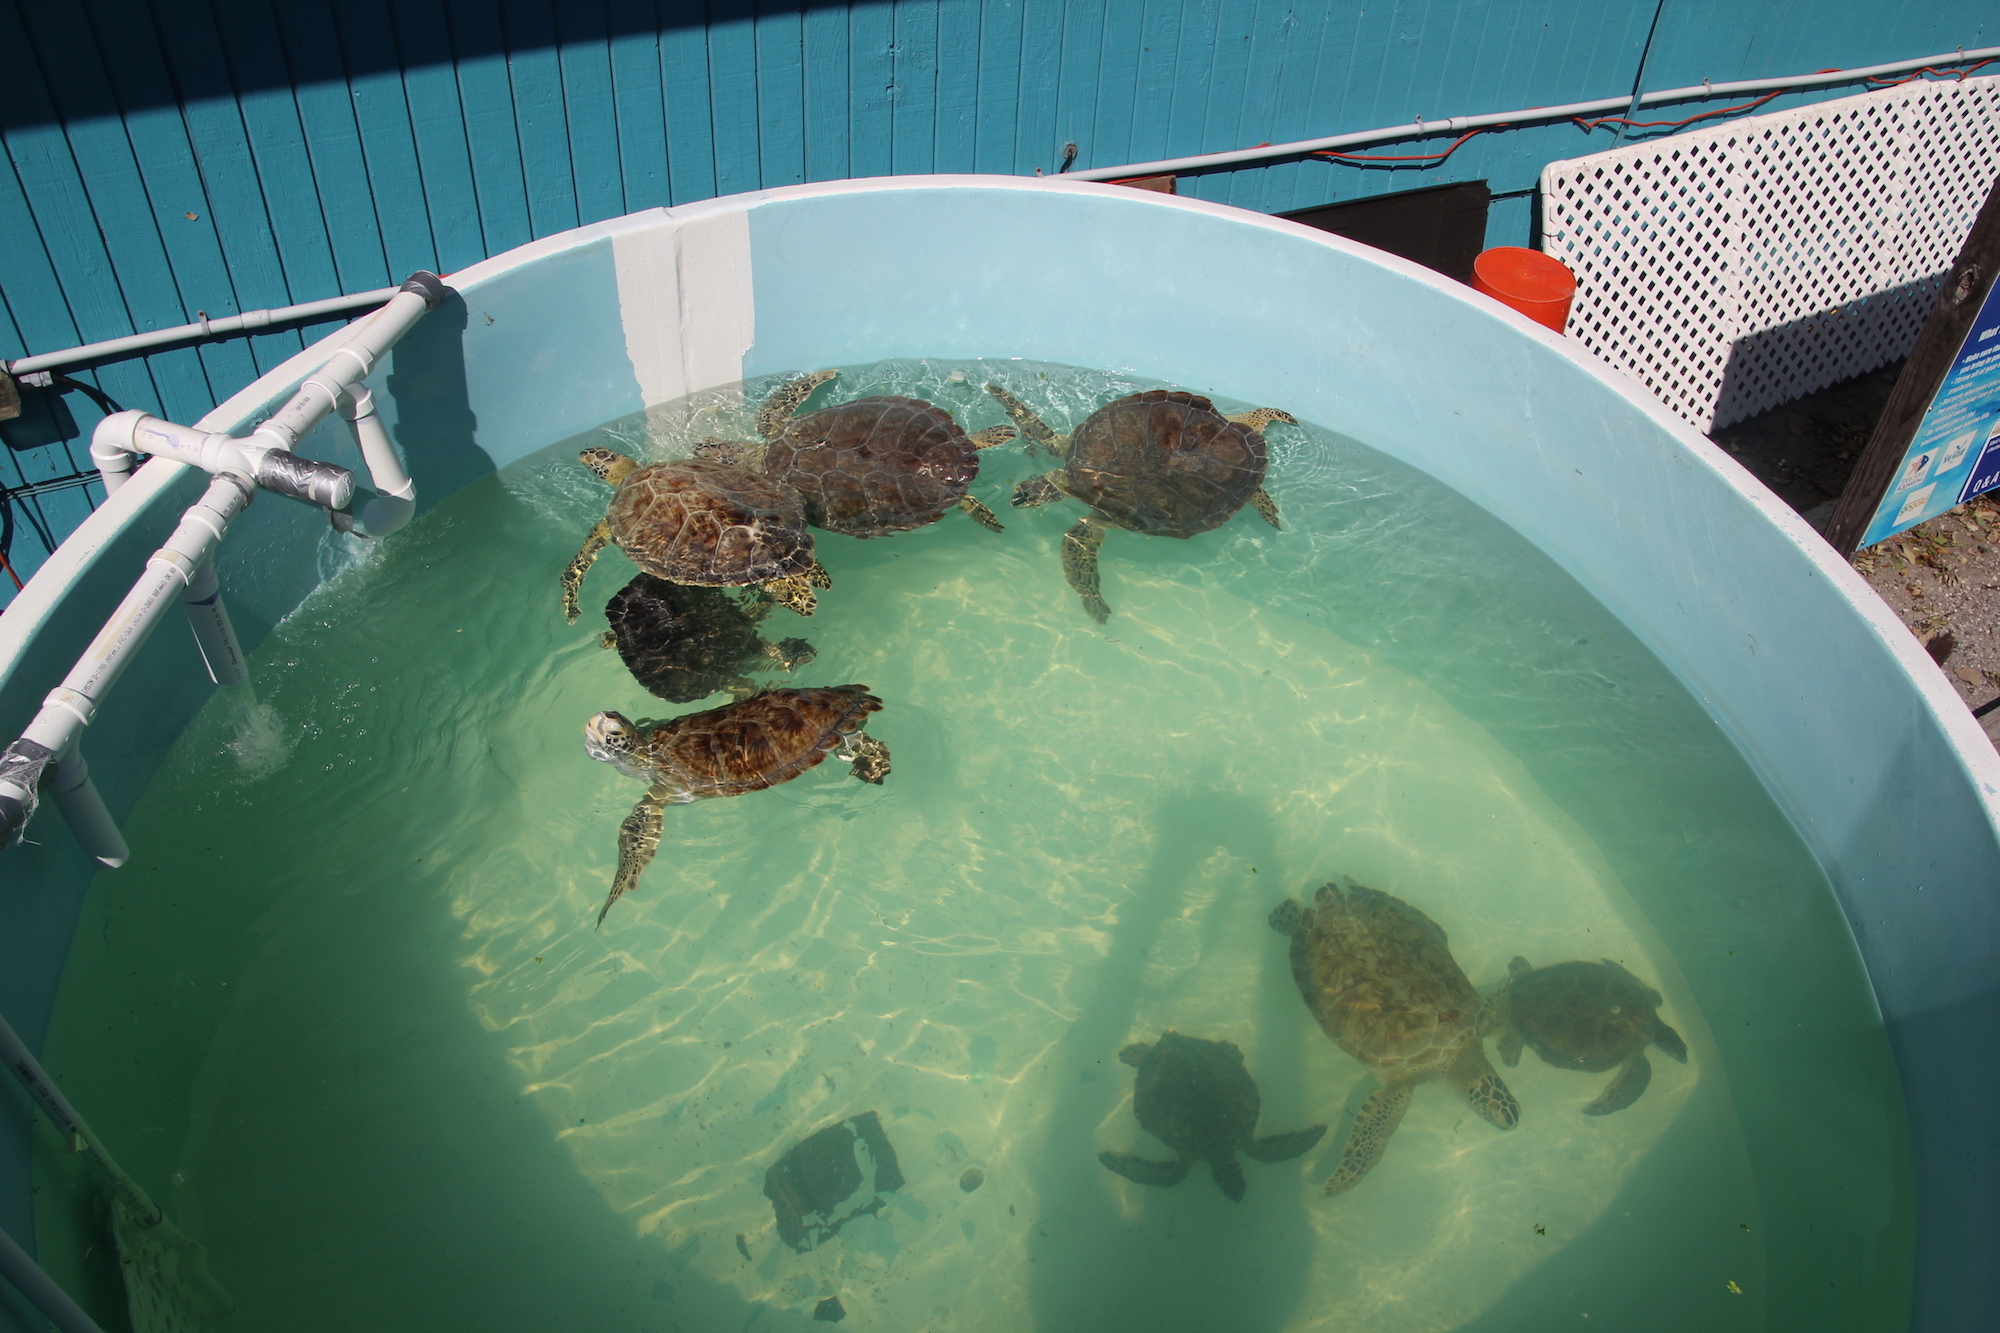 Several green sea turtles swimming in recirculating water tank